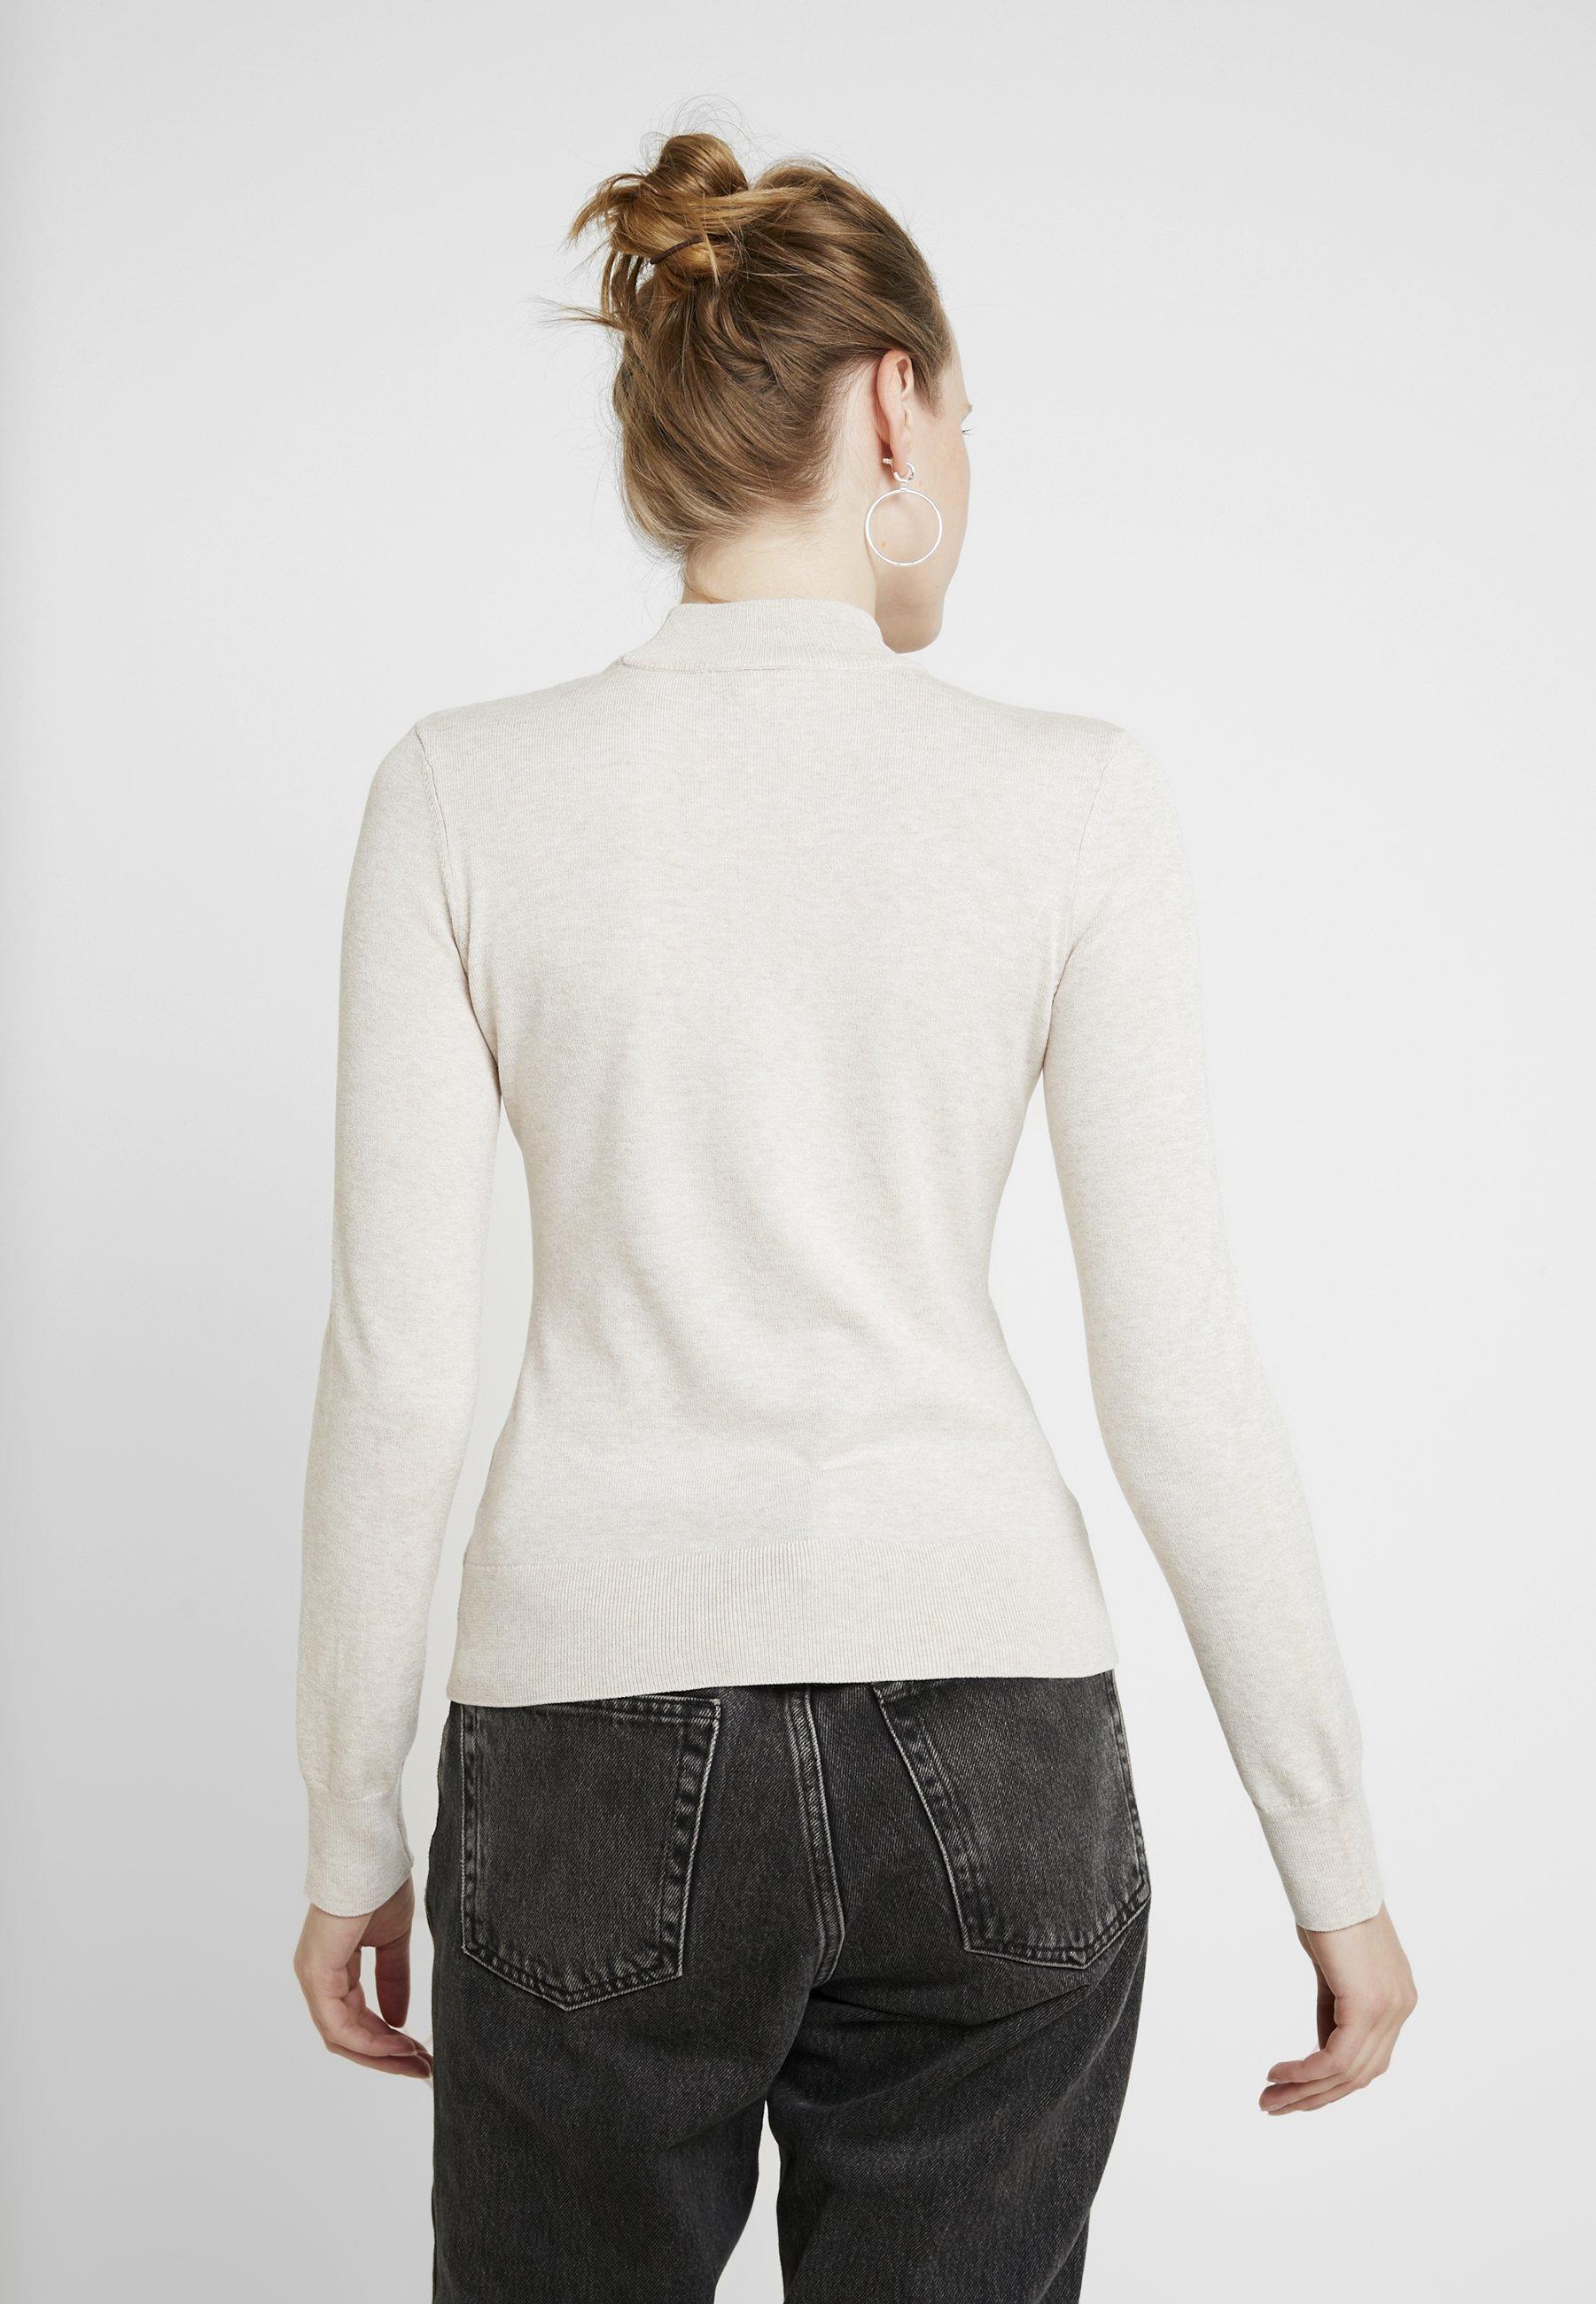 Monki Ingrid SweaterPullover SweaterPullover Beige Ingrid Monki TKJ3uF1lc